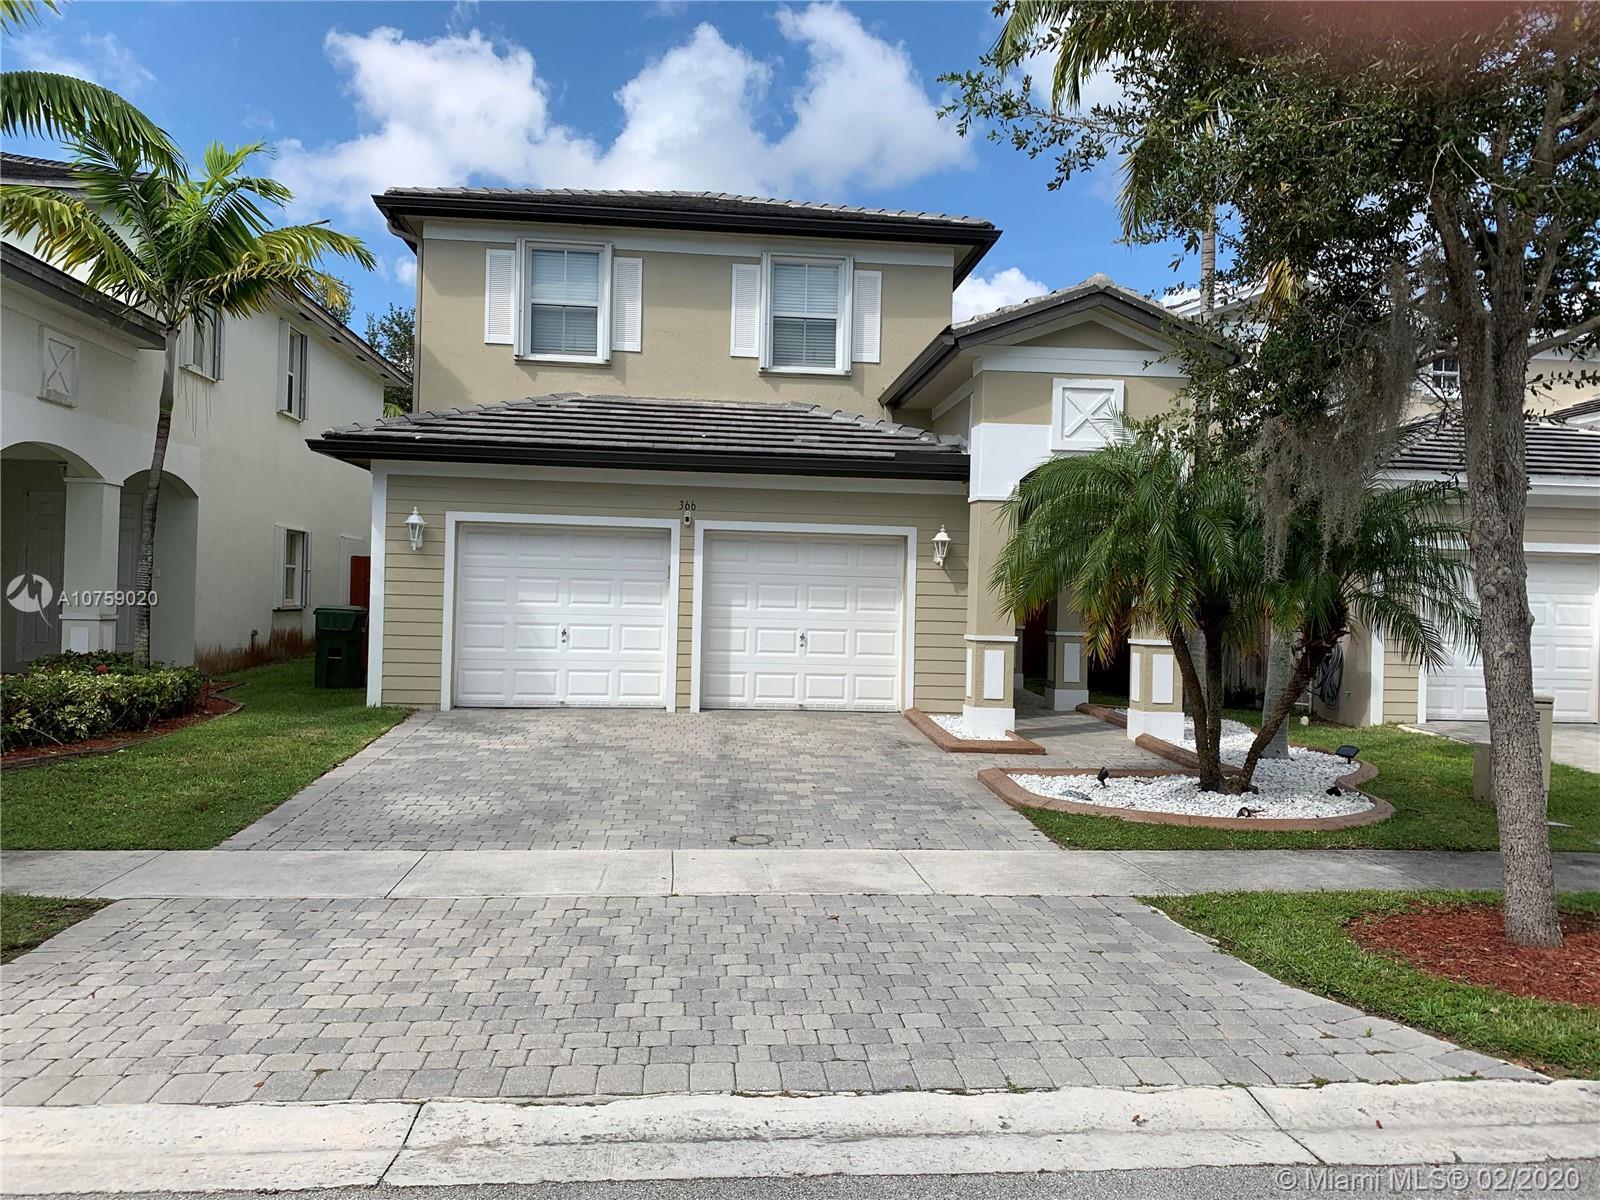 366 NE 36 Terr, Homestead, Florida